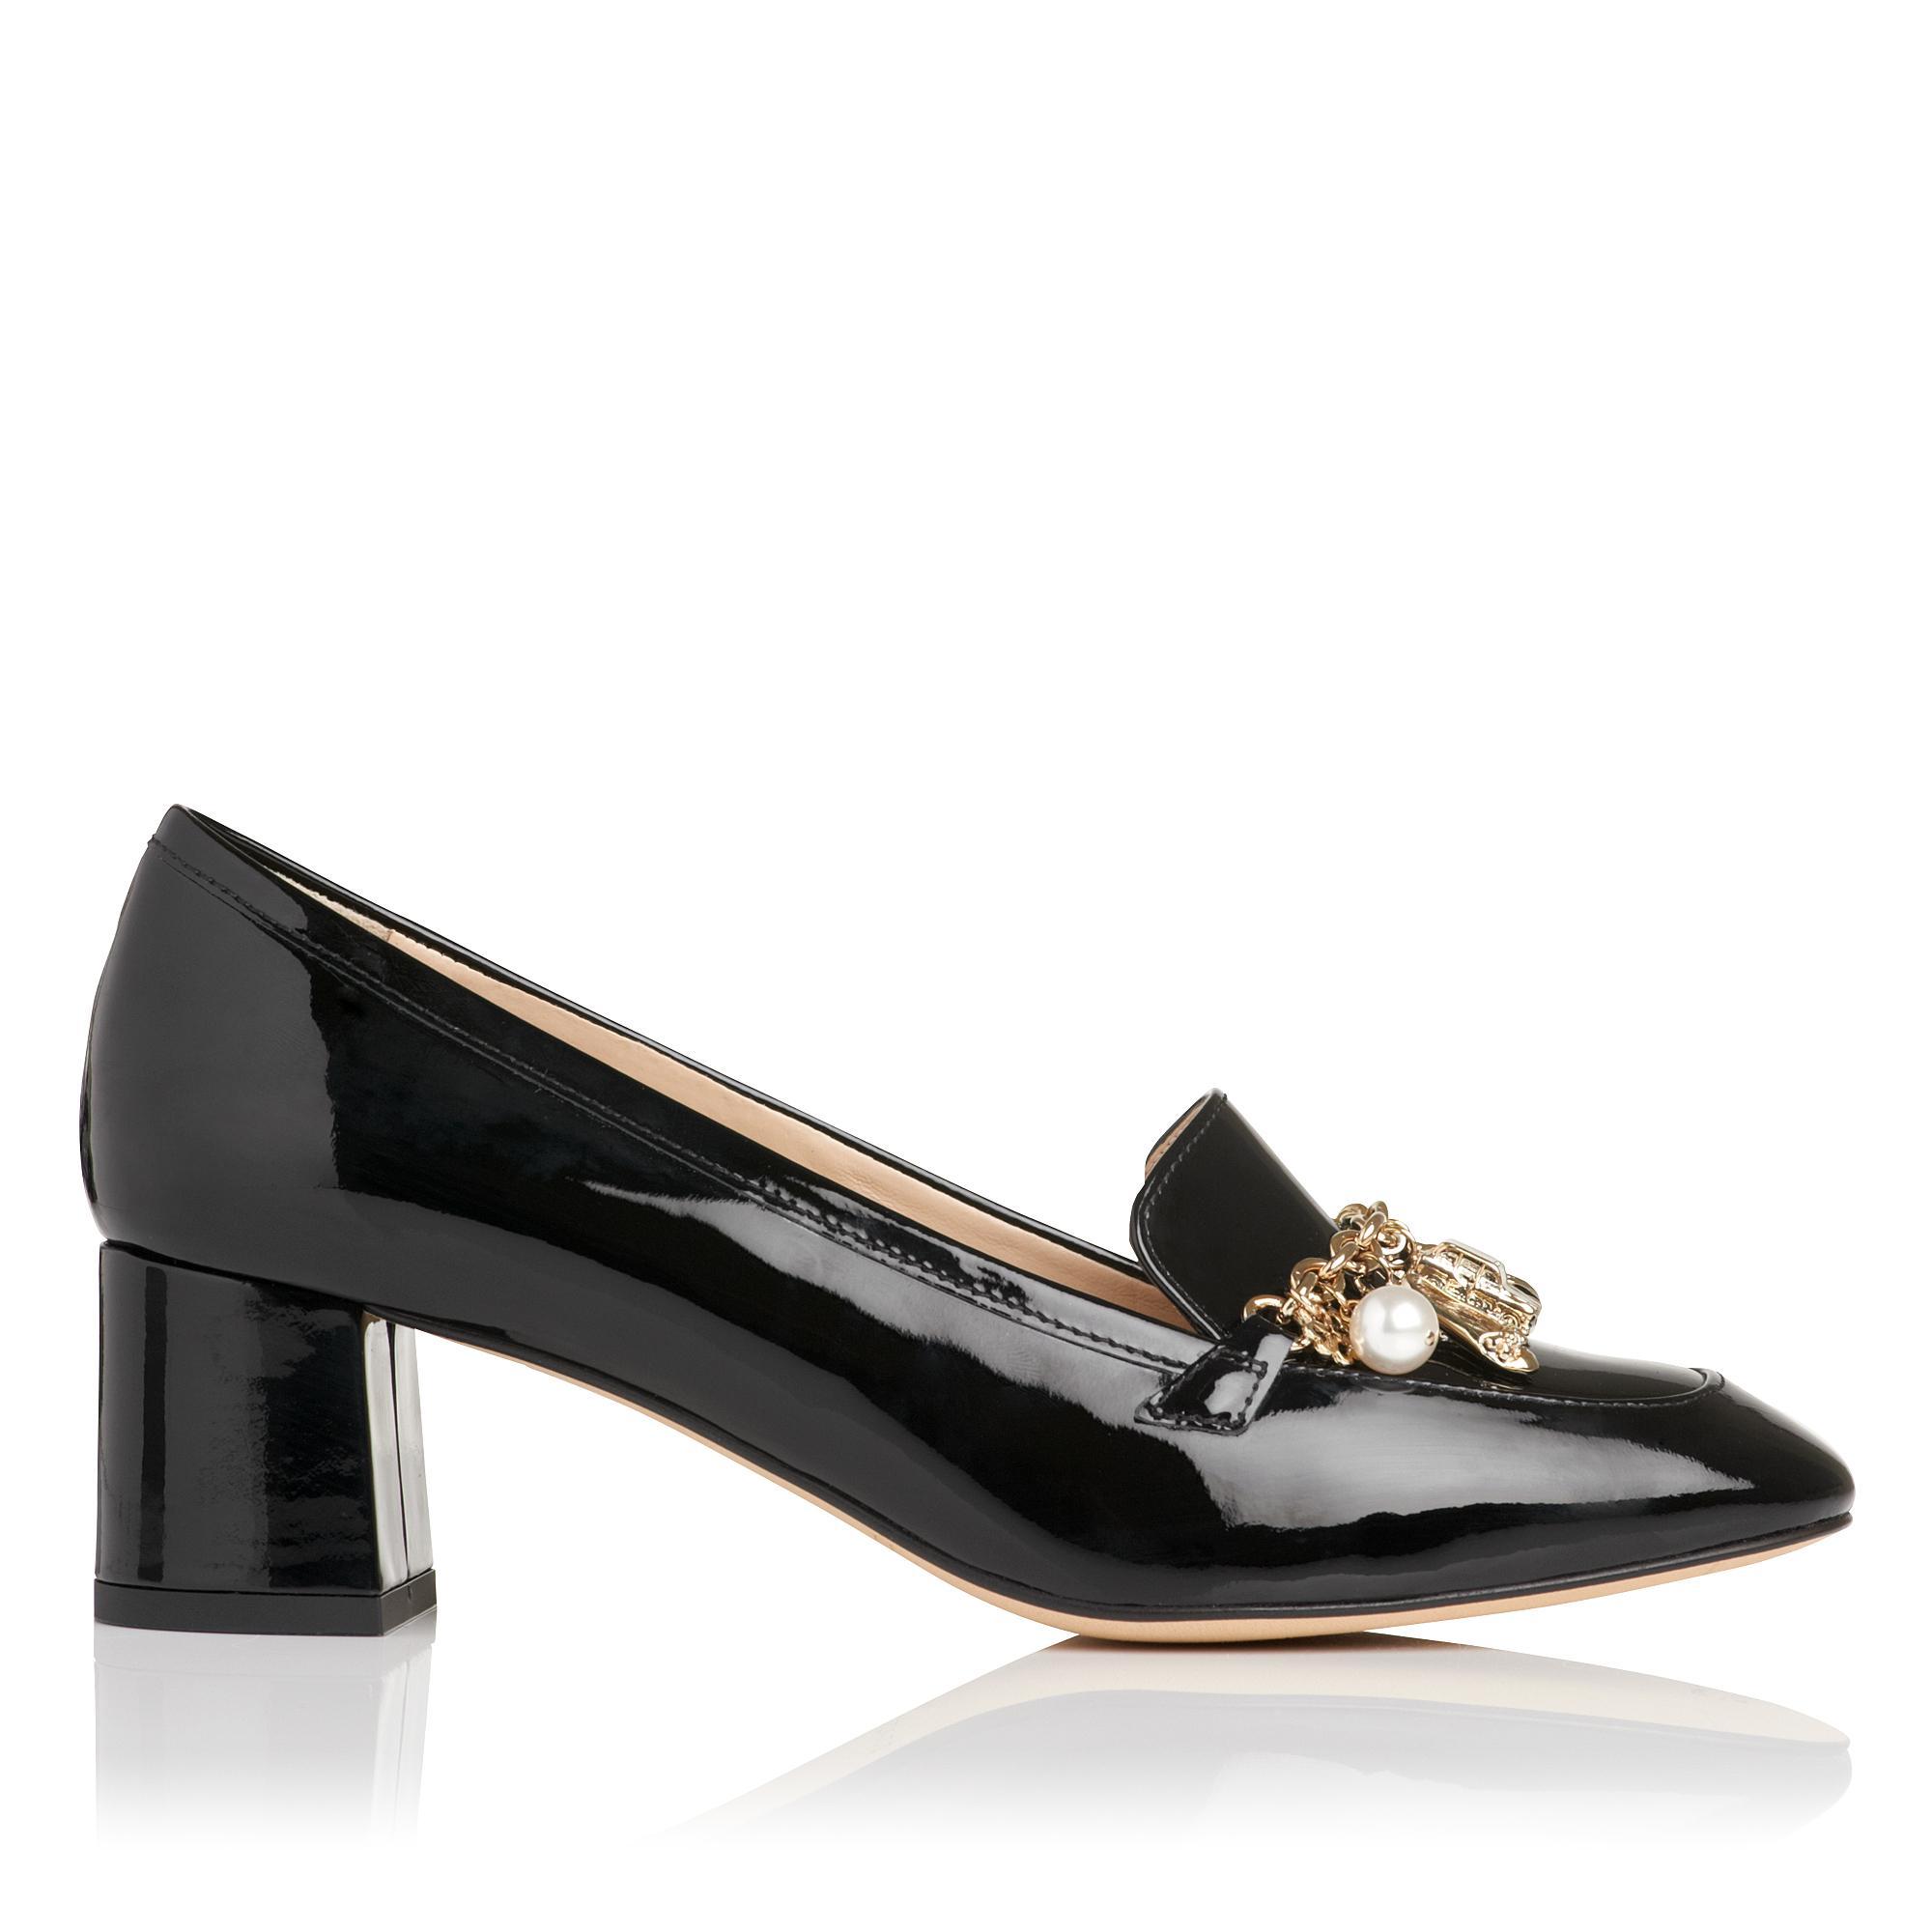 L.K.Bennett Maribel Patent Leather Heel